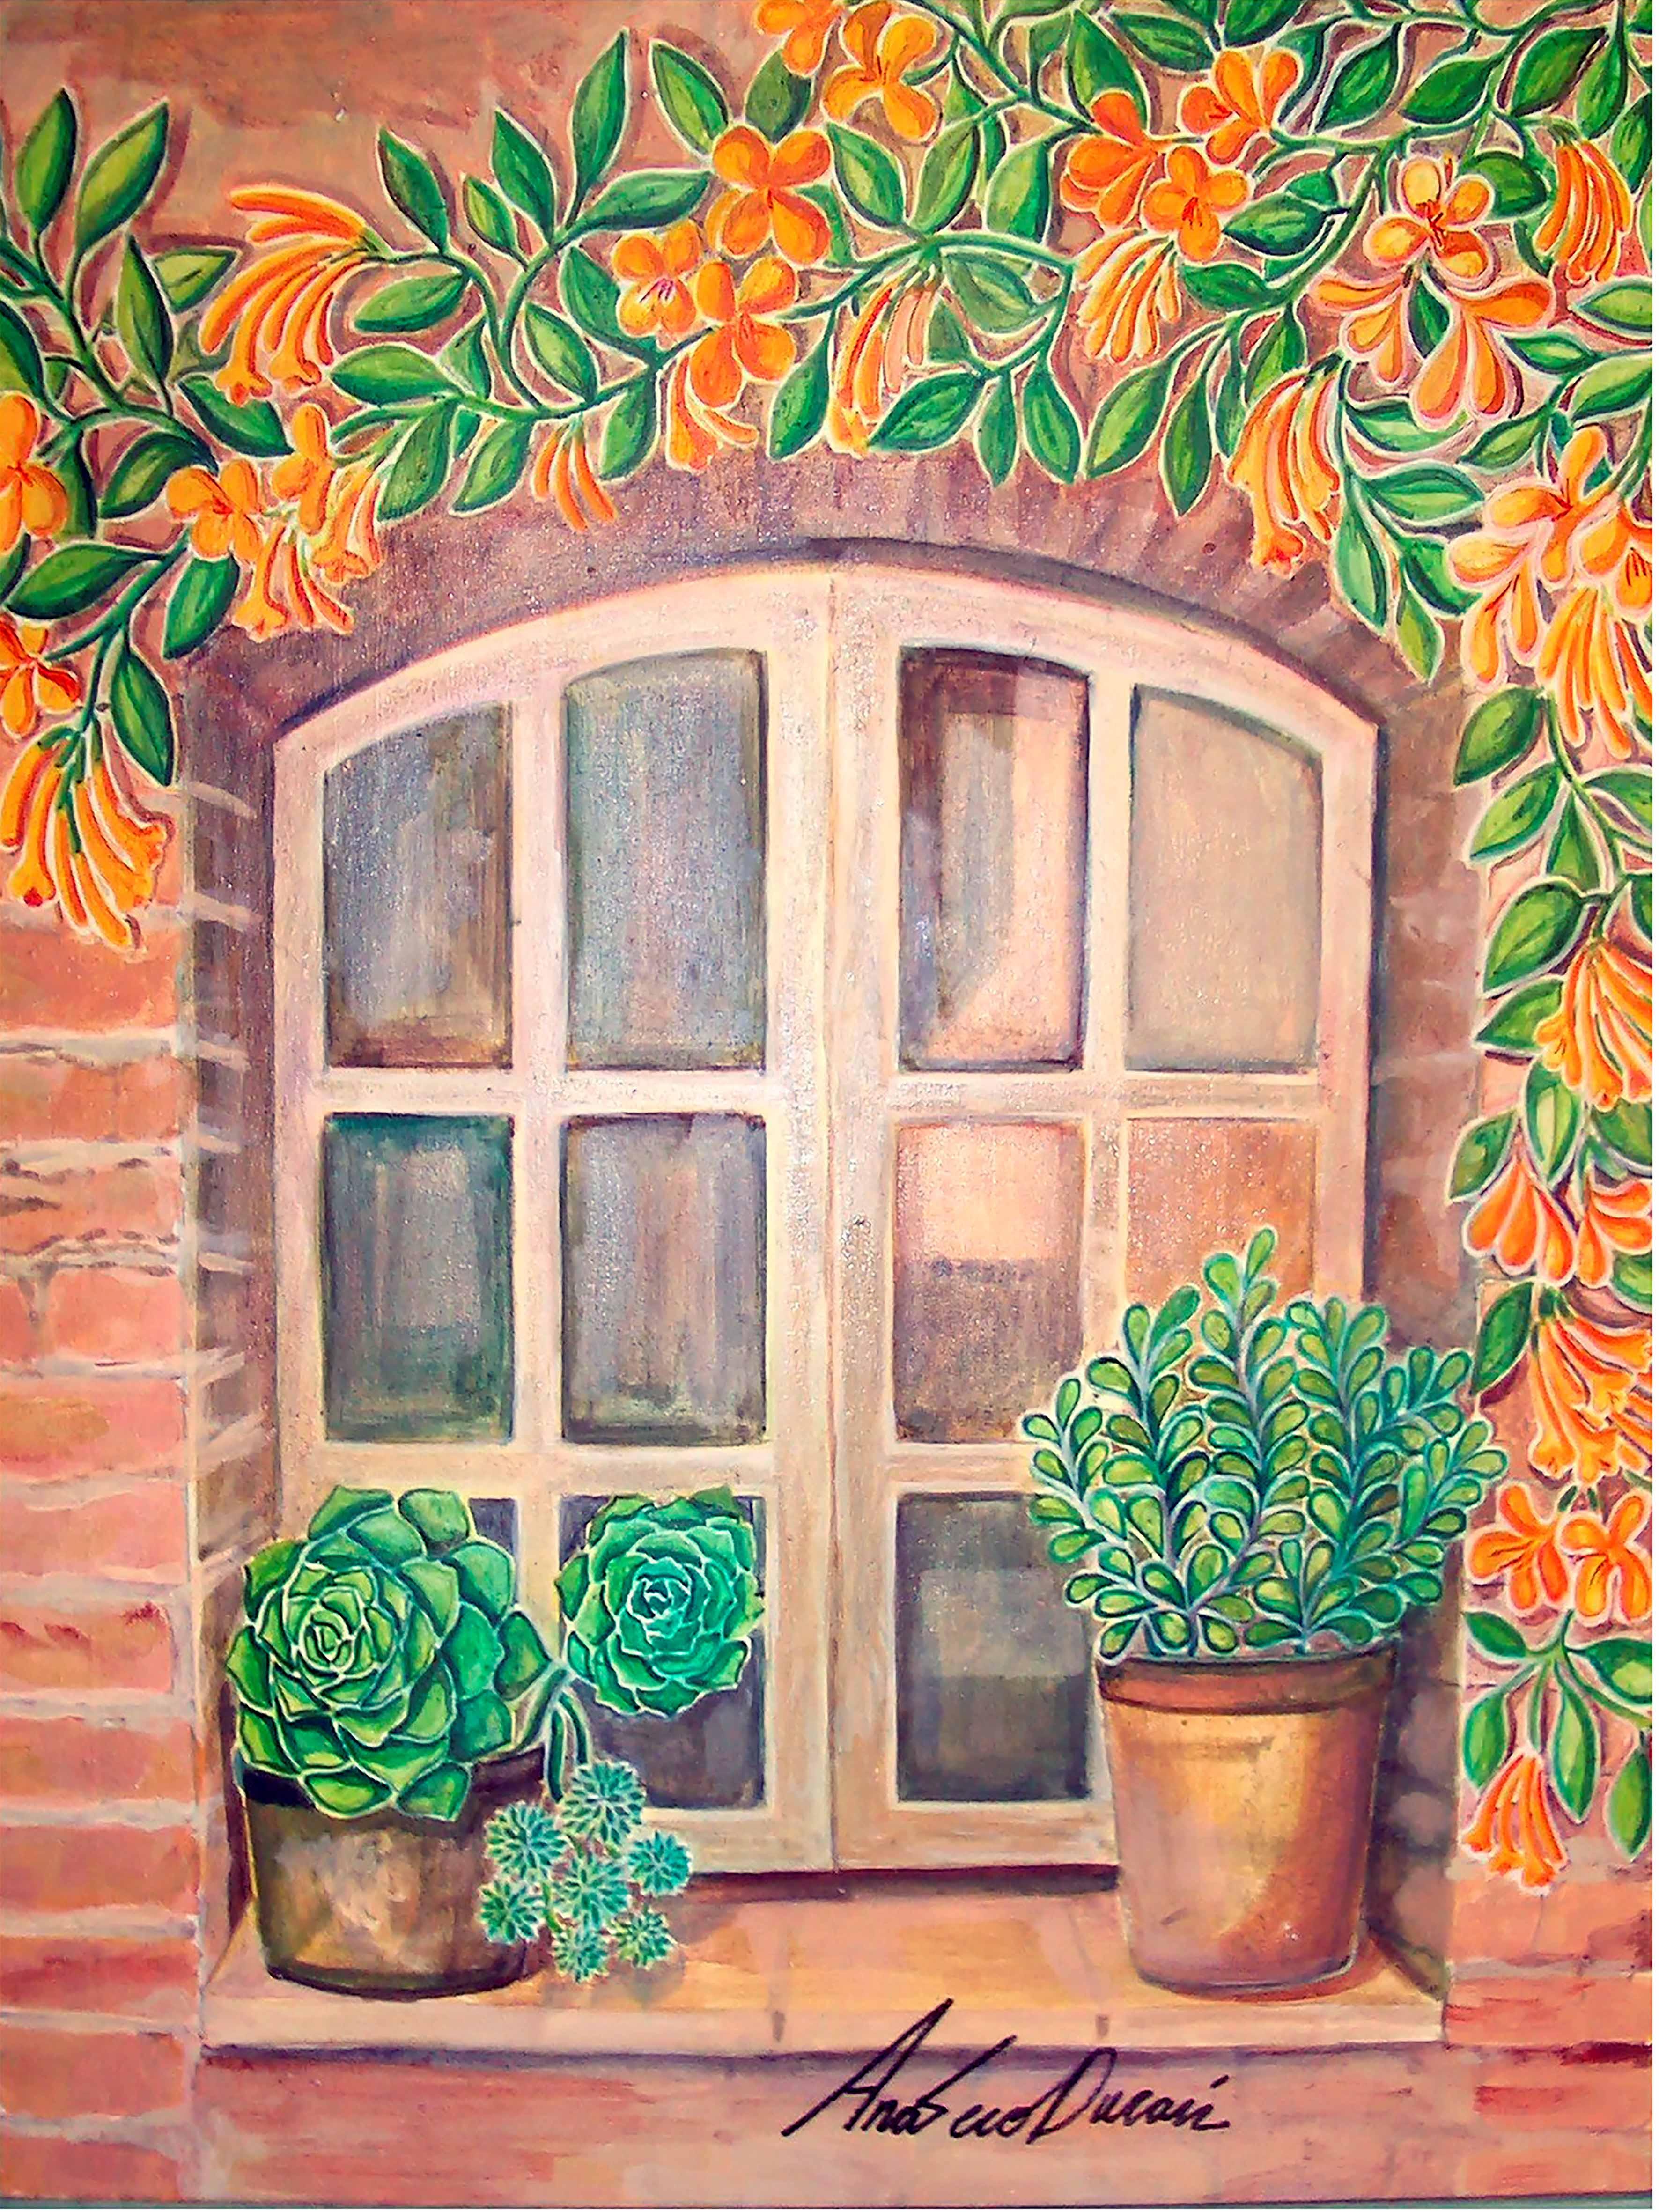 Ventana-WINDOW-